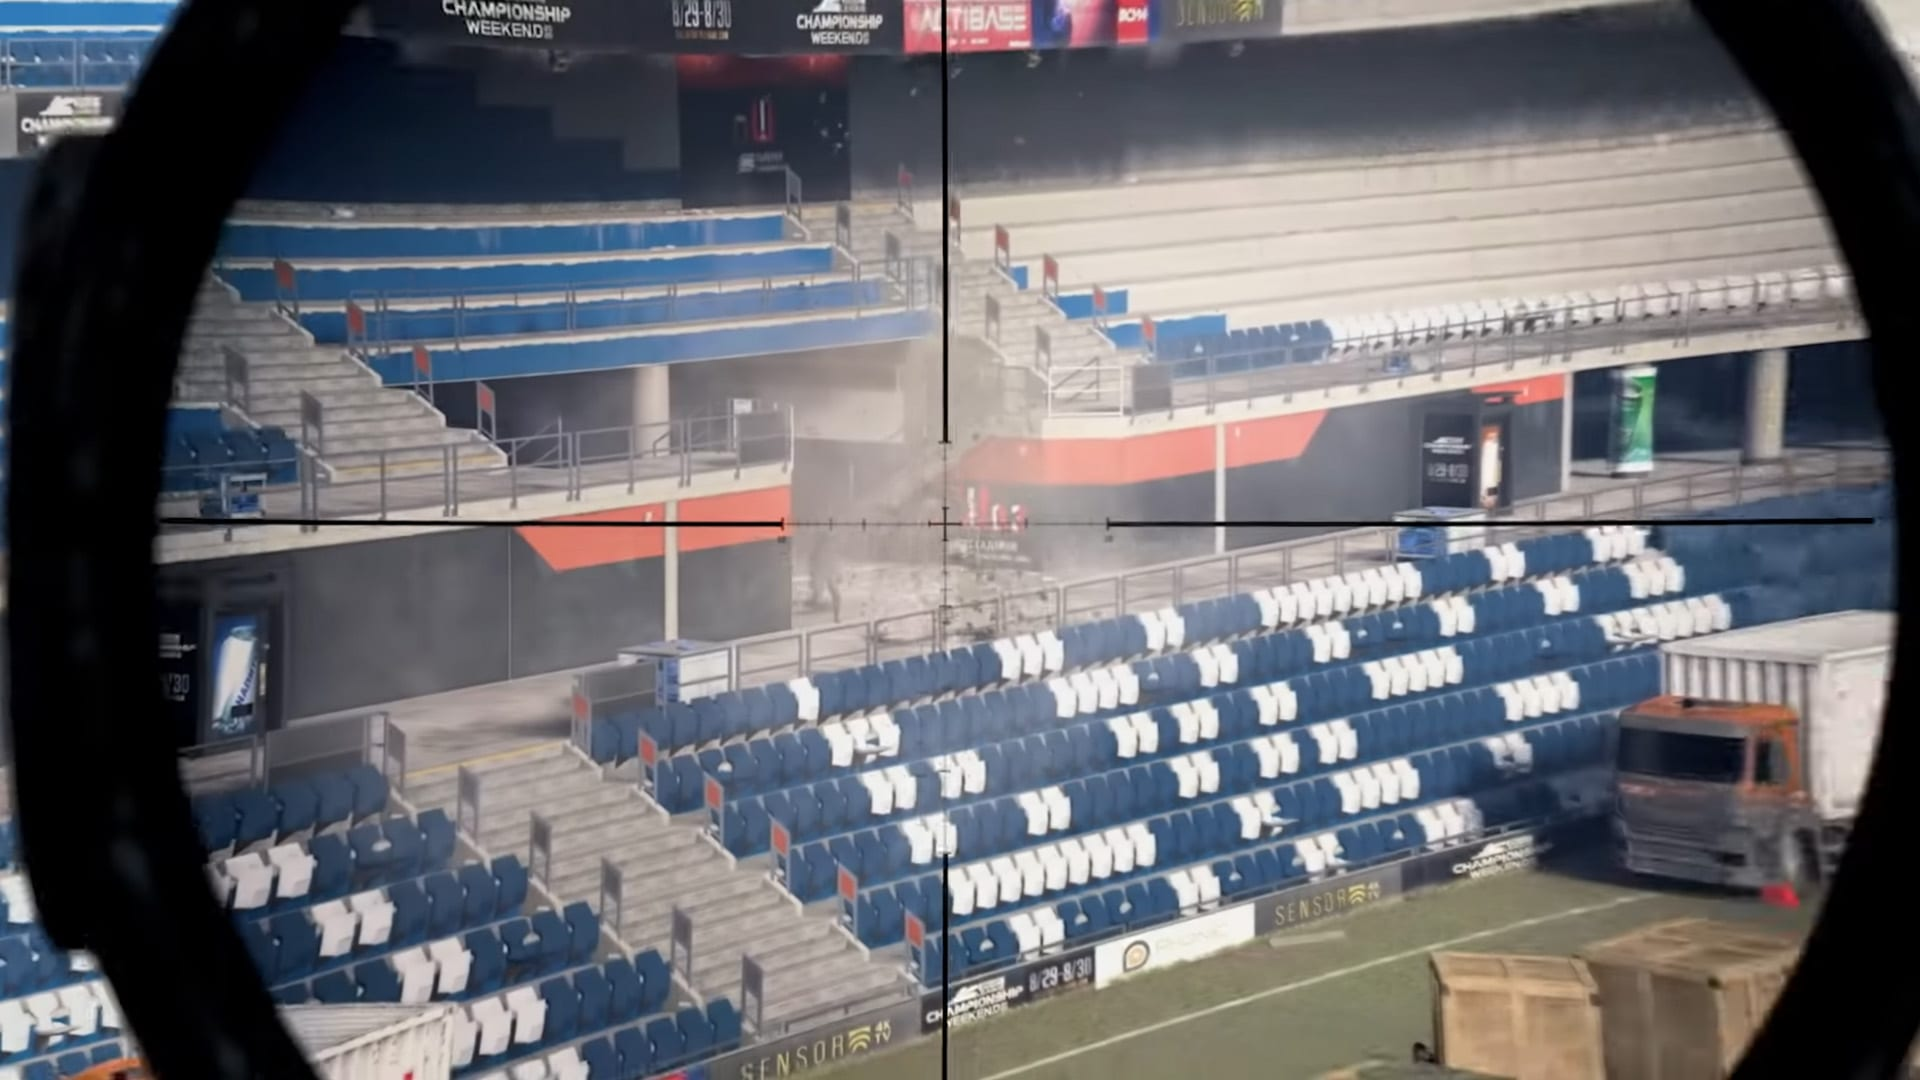 CoD Warzone Season 5 Stadion